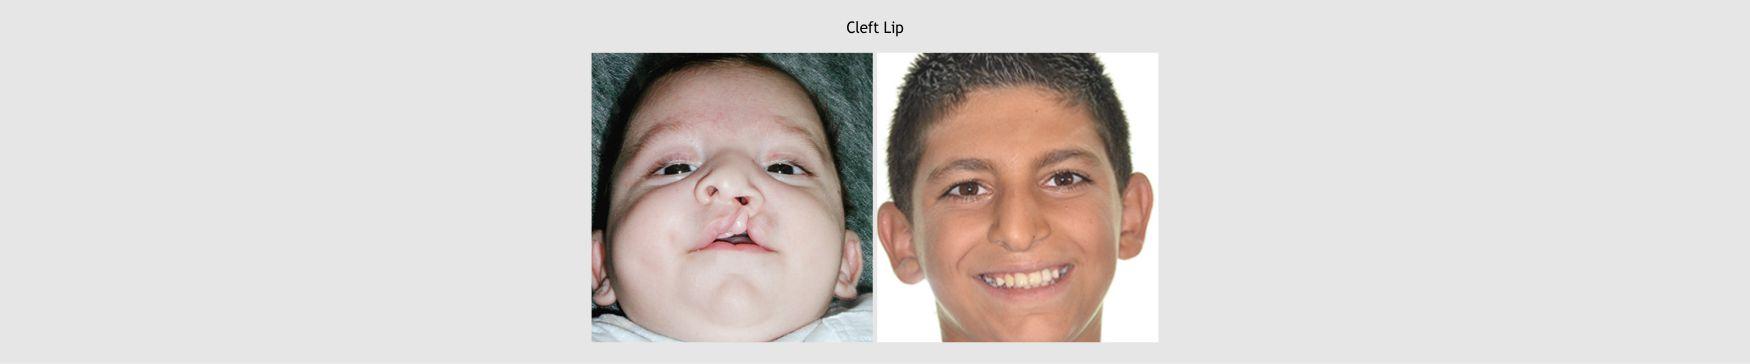 11-lip-surgery-1